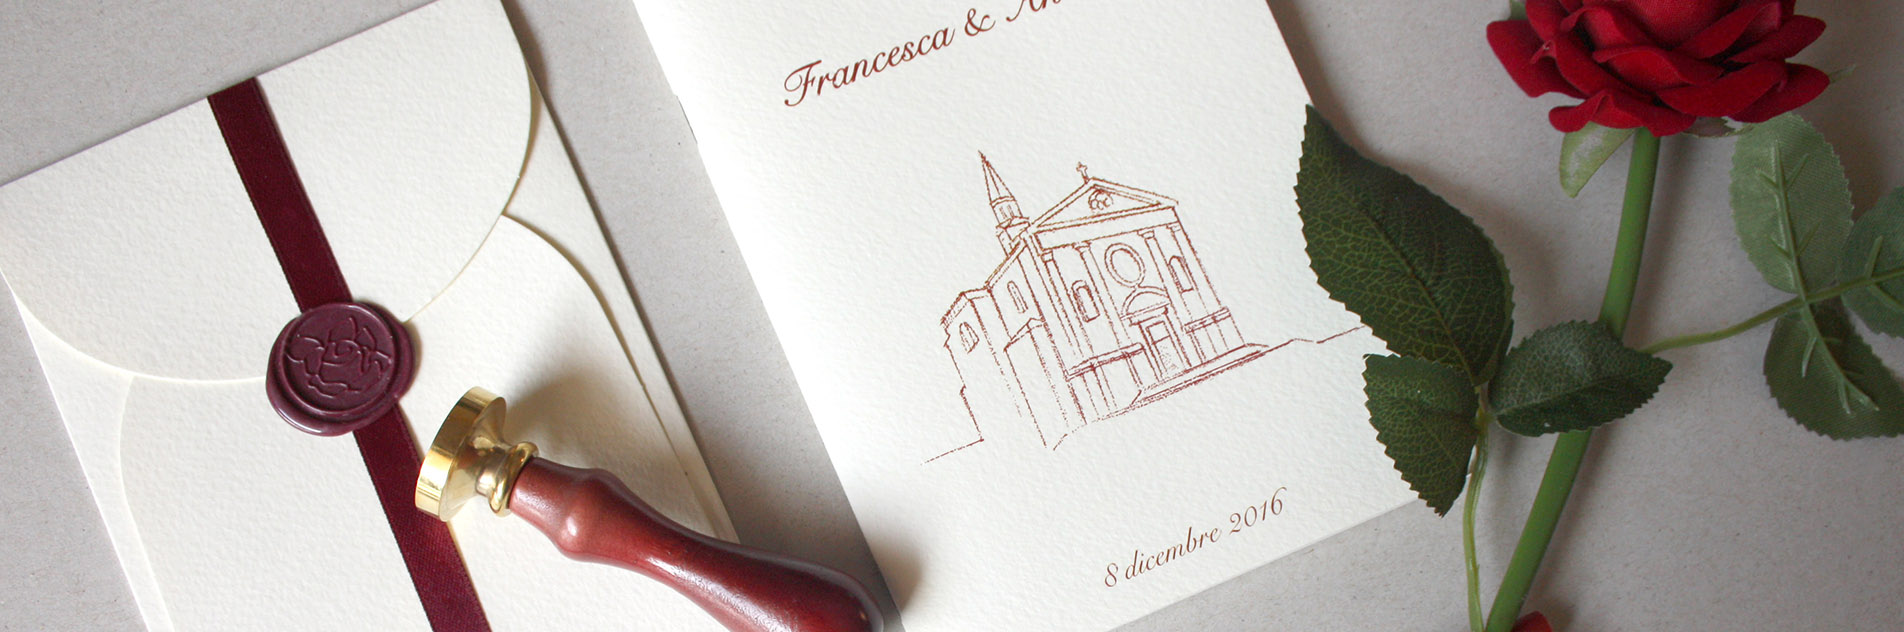 Inviti Matrimonio Girasoli : Matrimonio a tema girasoli u listanozzeonline